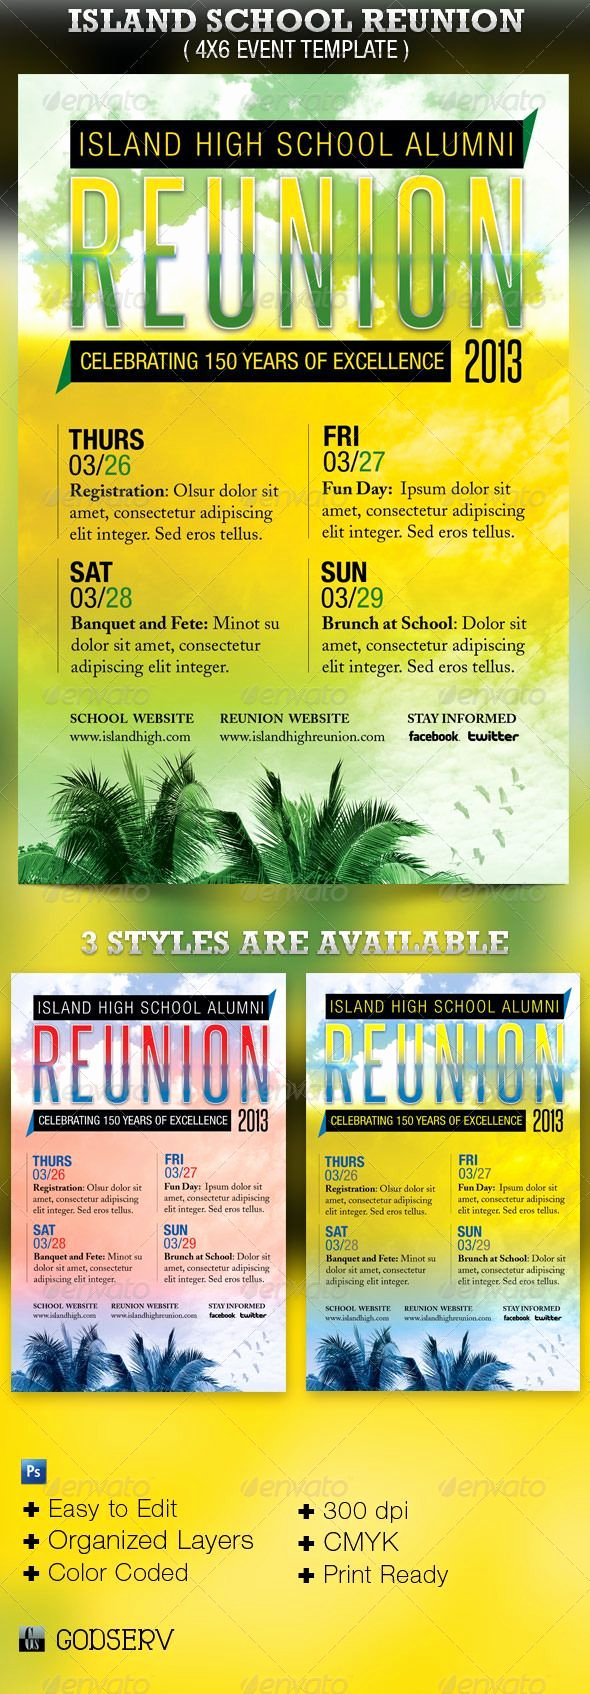 Family Reunion Flyer Templates Lovely island School Reunion Flyer Template $6 00